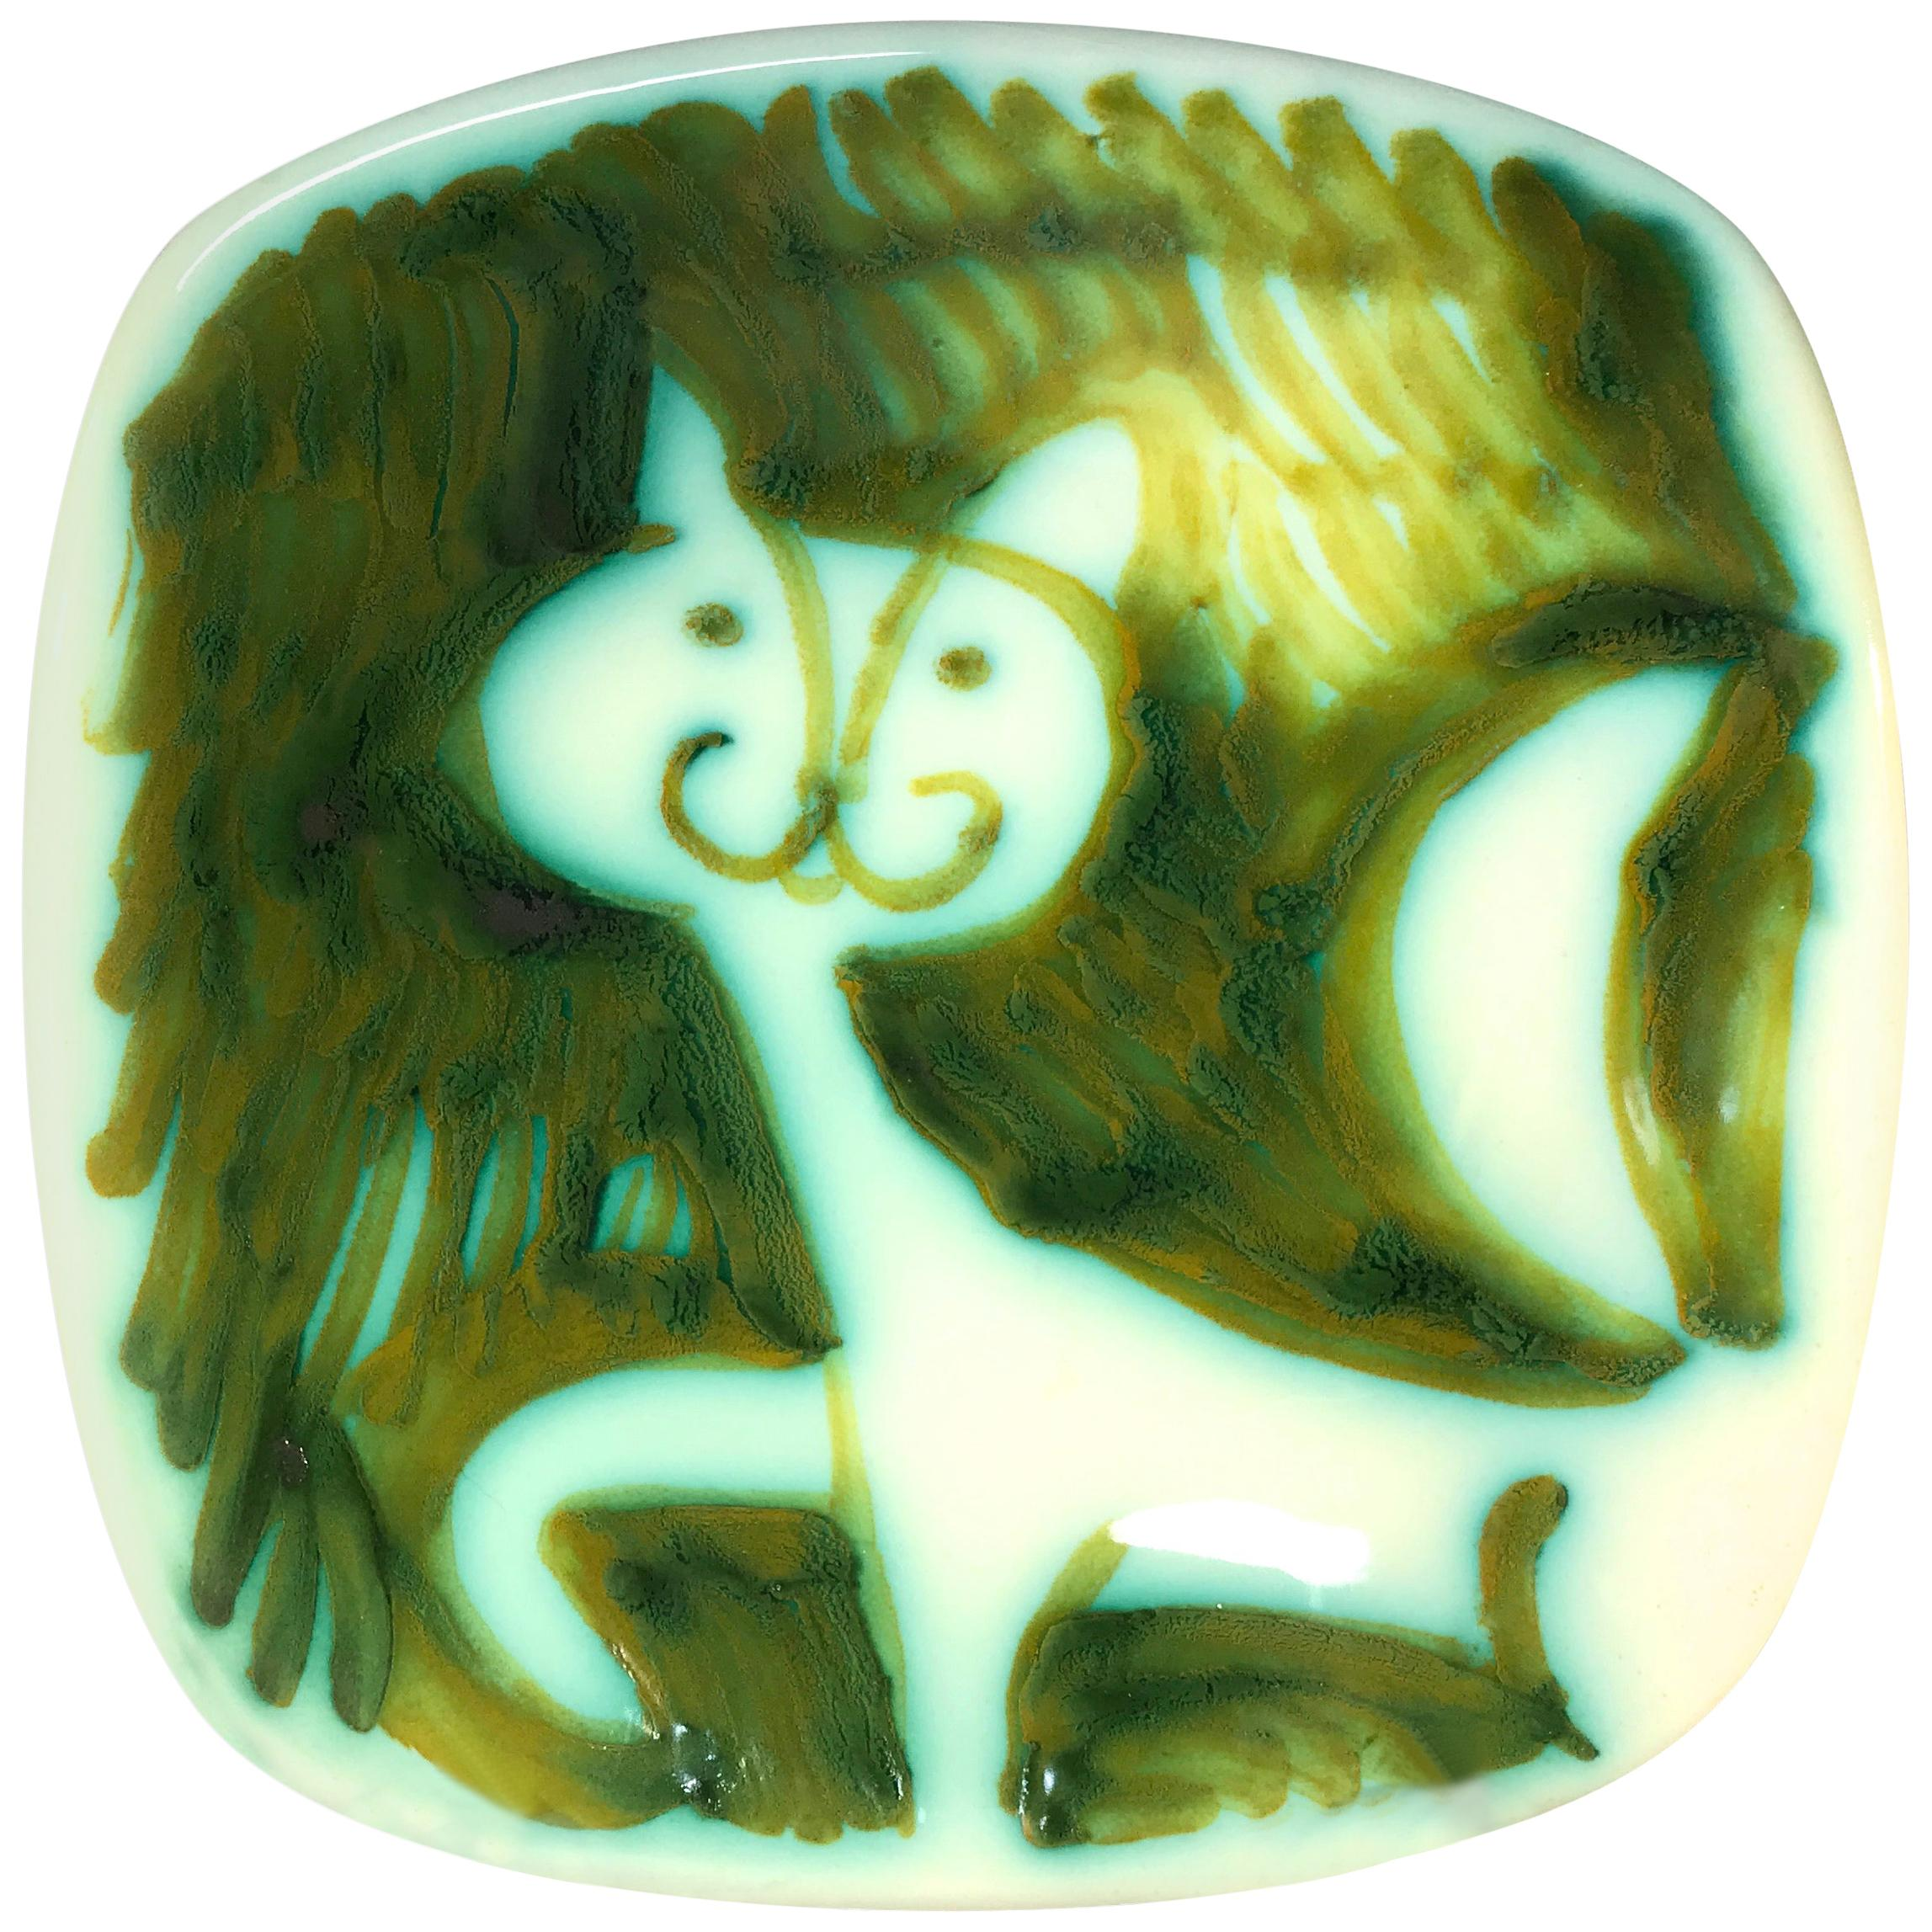 Alessio Tasca Signed 1960s Prowling Cat Ceramic Square Italian Midcentury Dish